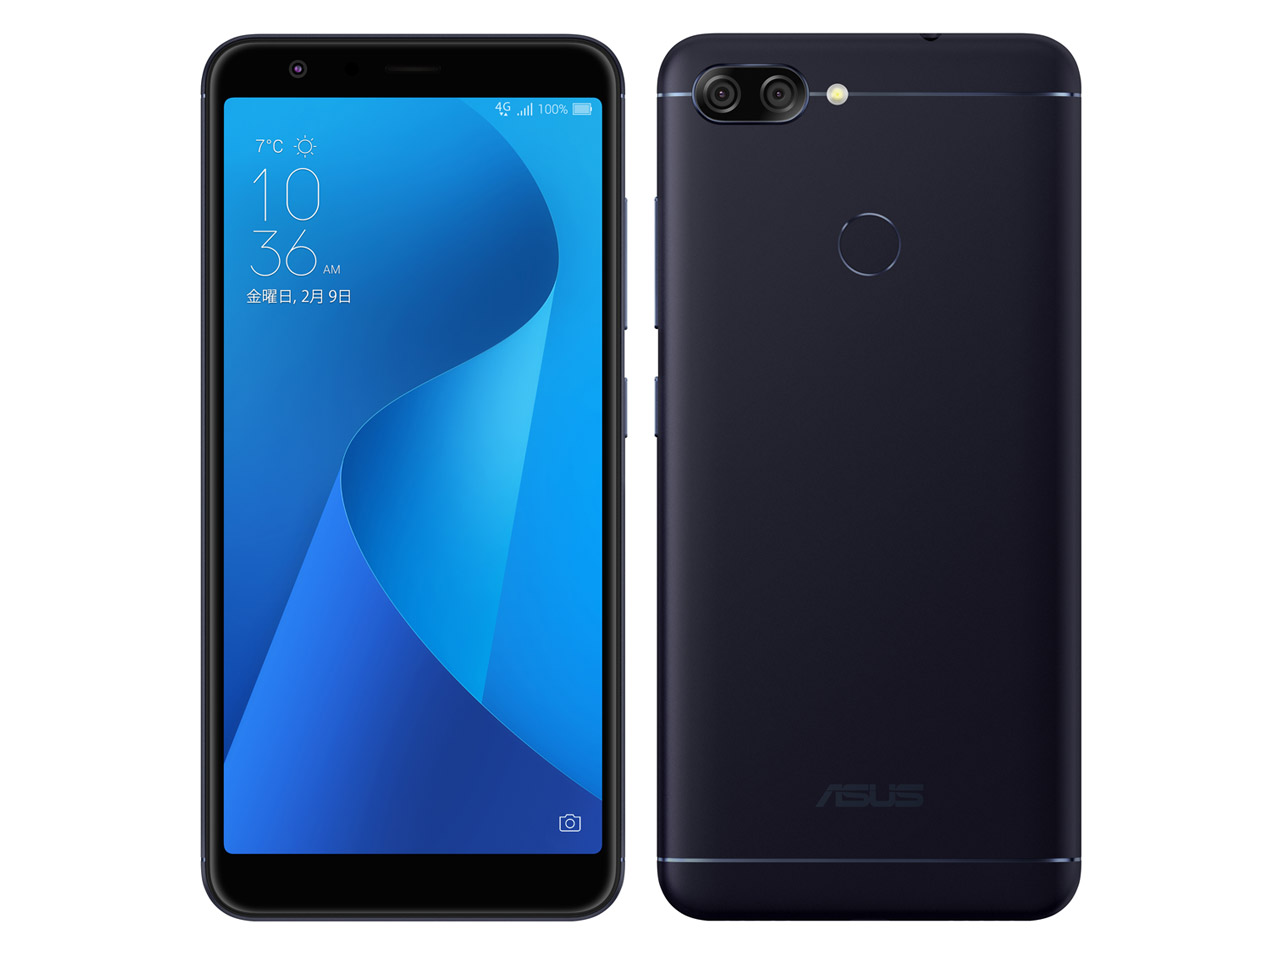 ZenFone Max Plus (M1) SIMフリー の製品画像